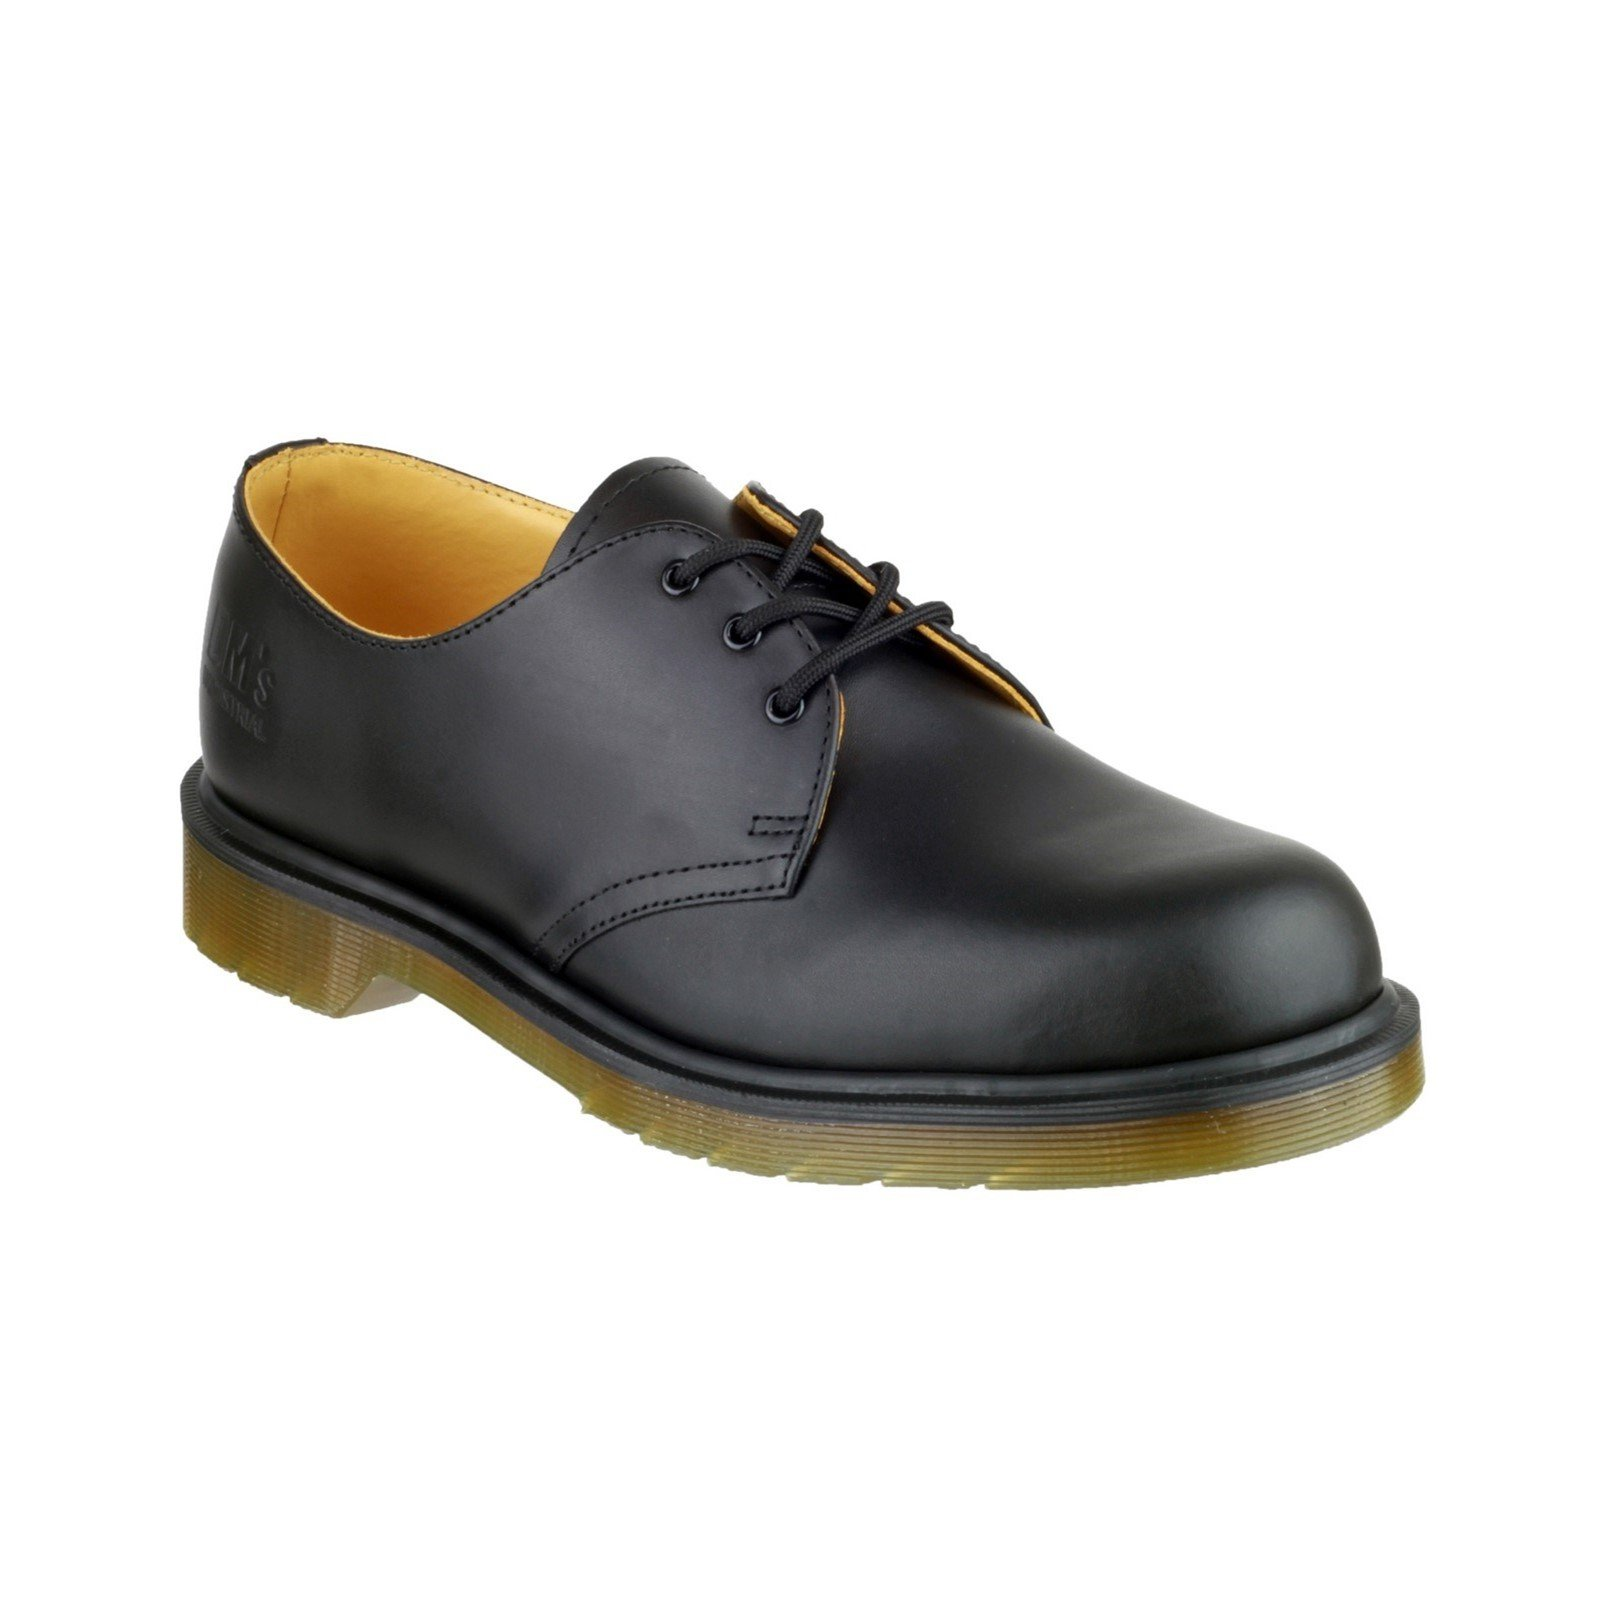 Dr Martens Men's Lace-Up Leather Derby Shoe Black 04915 - Black 8